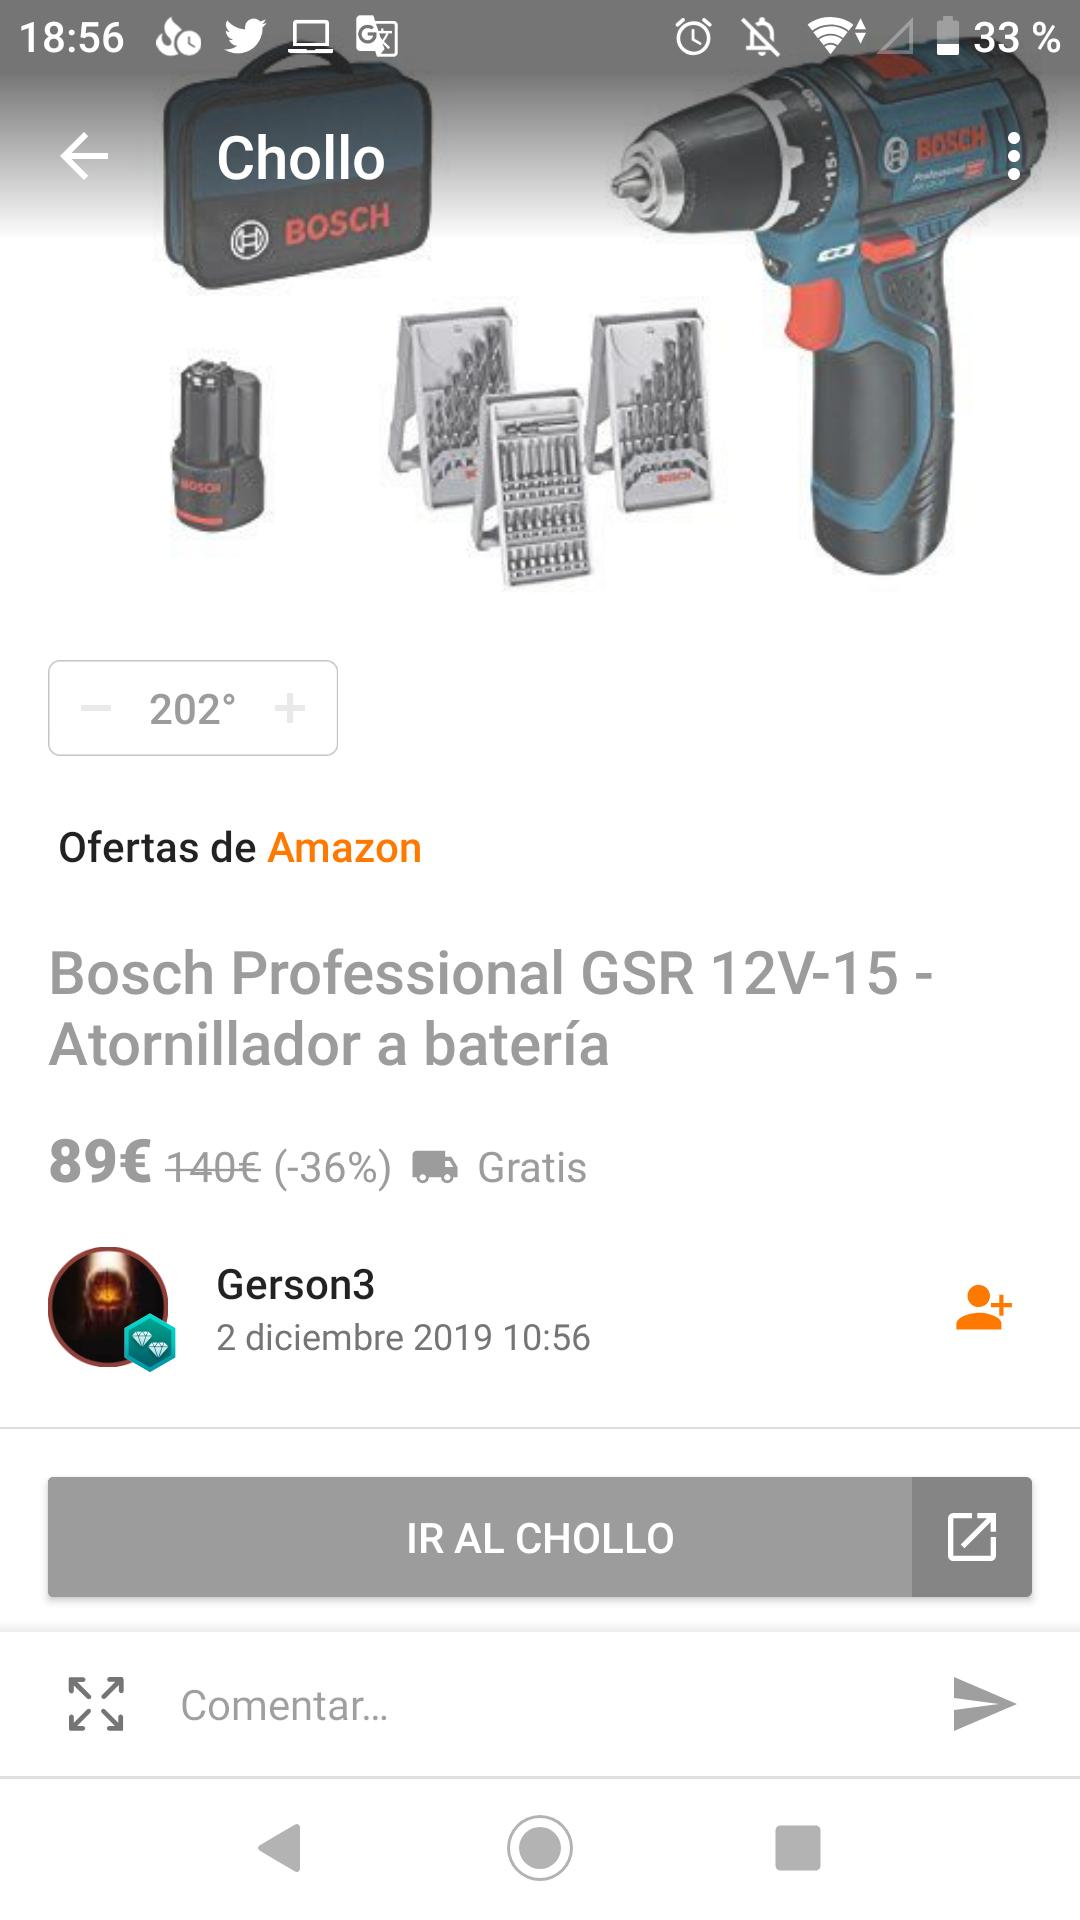 3126669-EuBZh.jpg